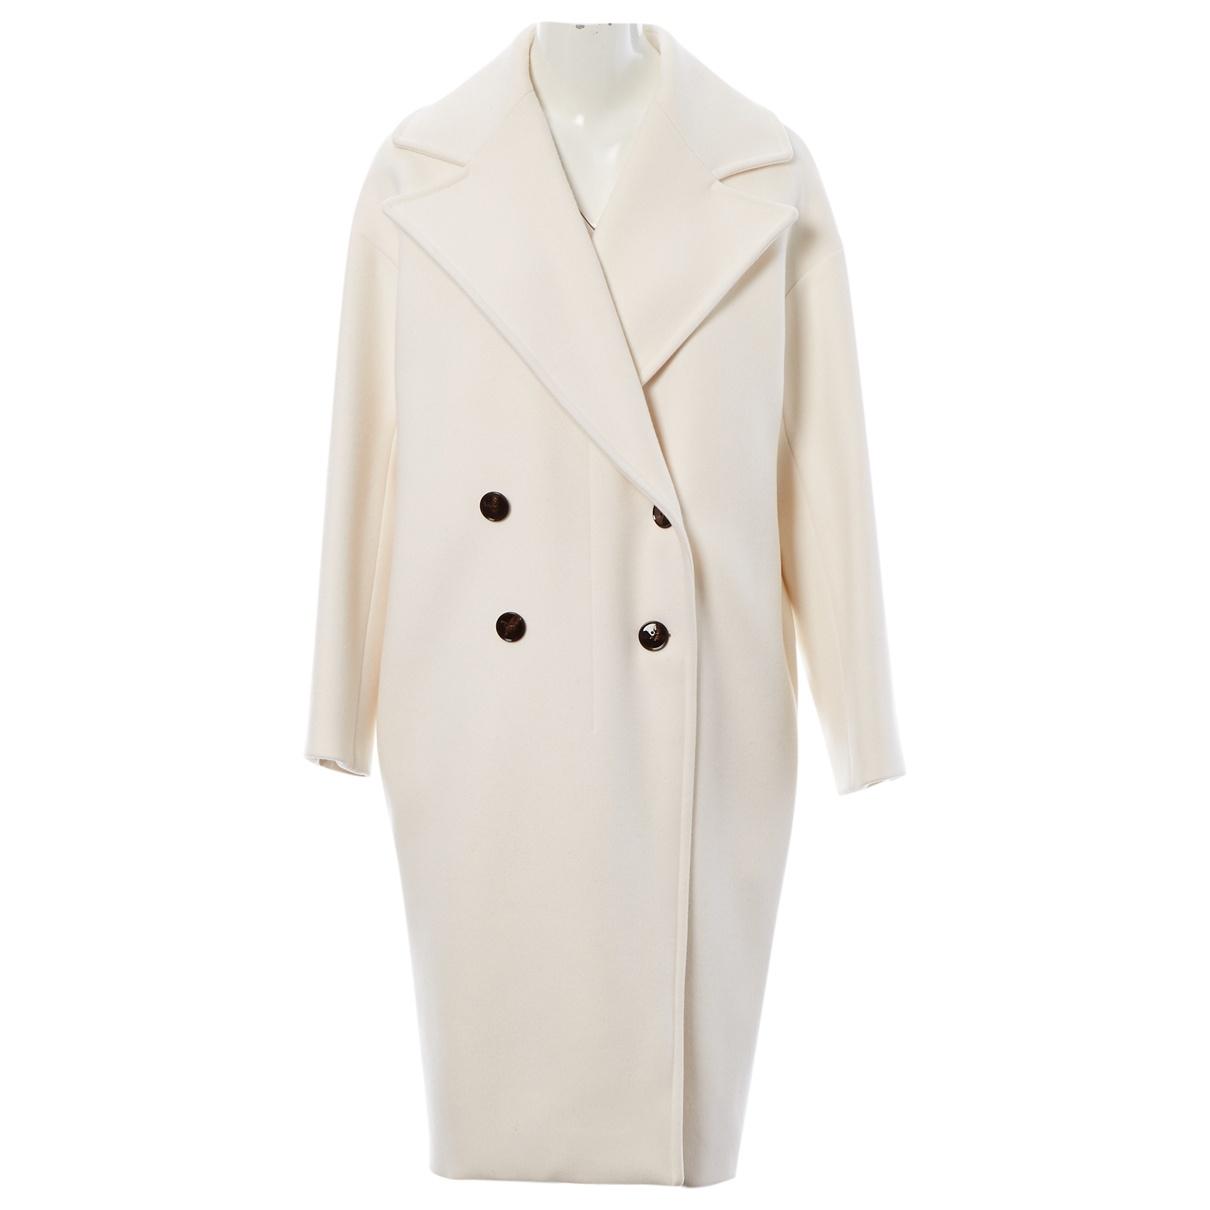 Dior \N Ecru Cashmere coat for Women 40 FR